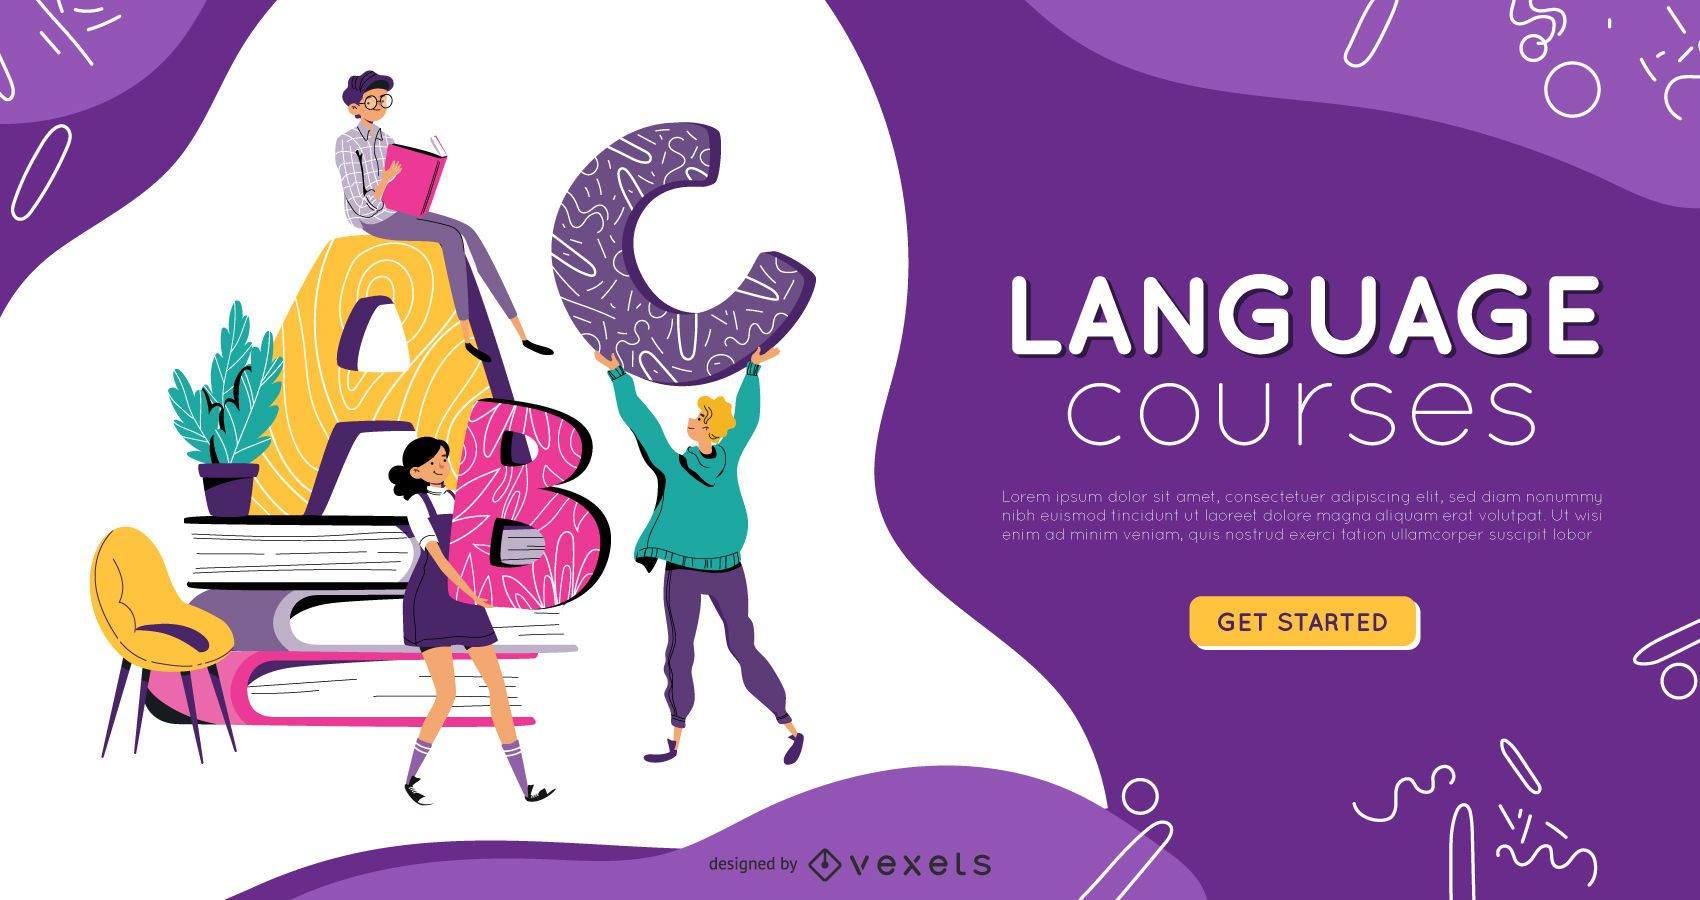 Sprachkurs Bildung Cover Design